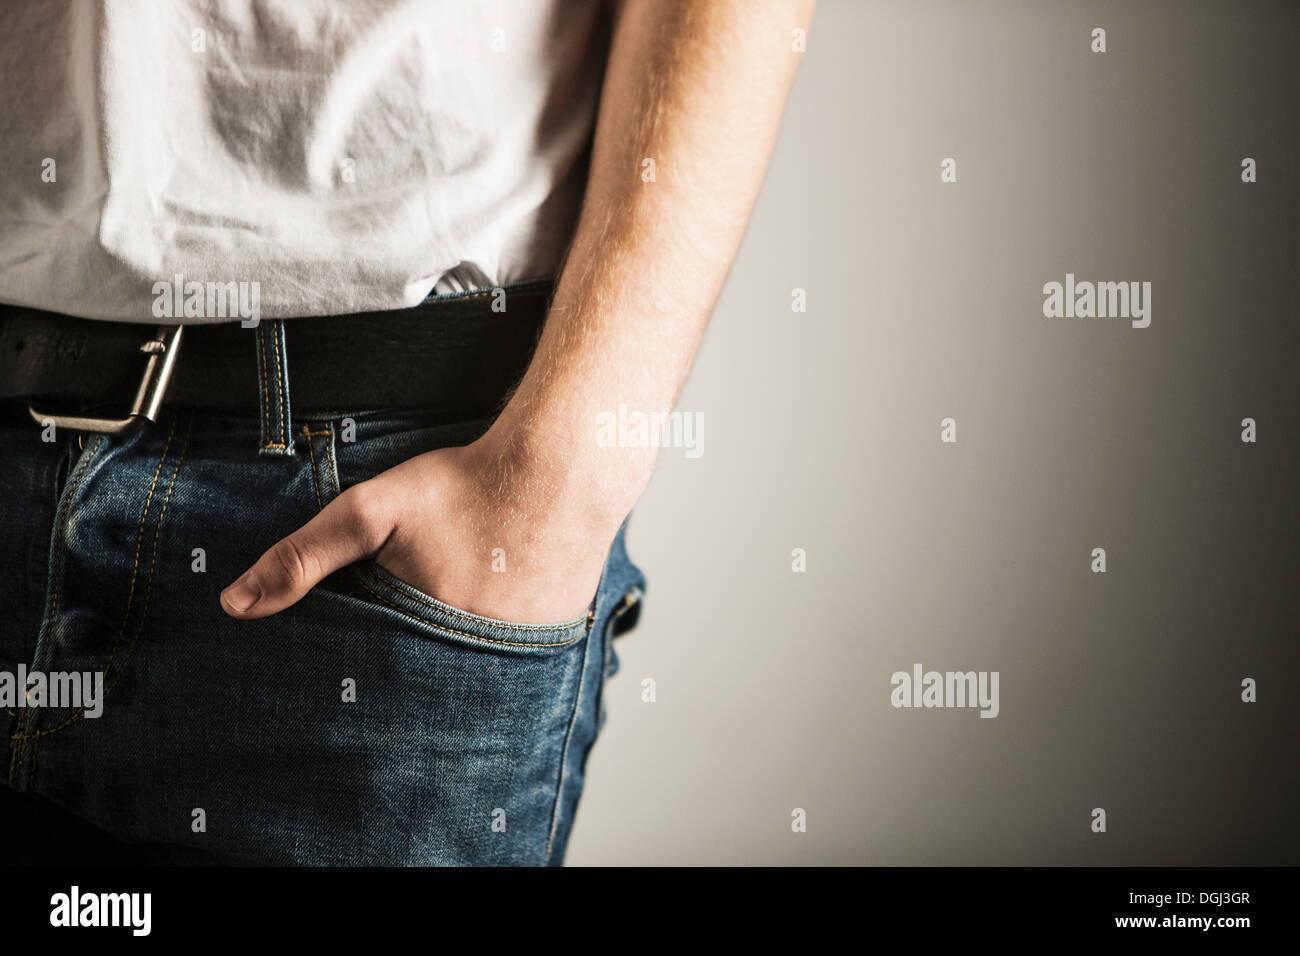 Cropped shot of hand inside pocket of jeans - Stock Image